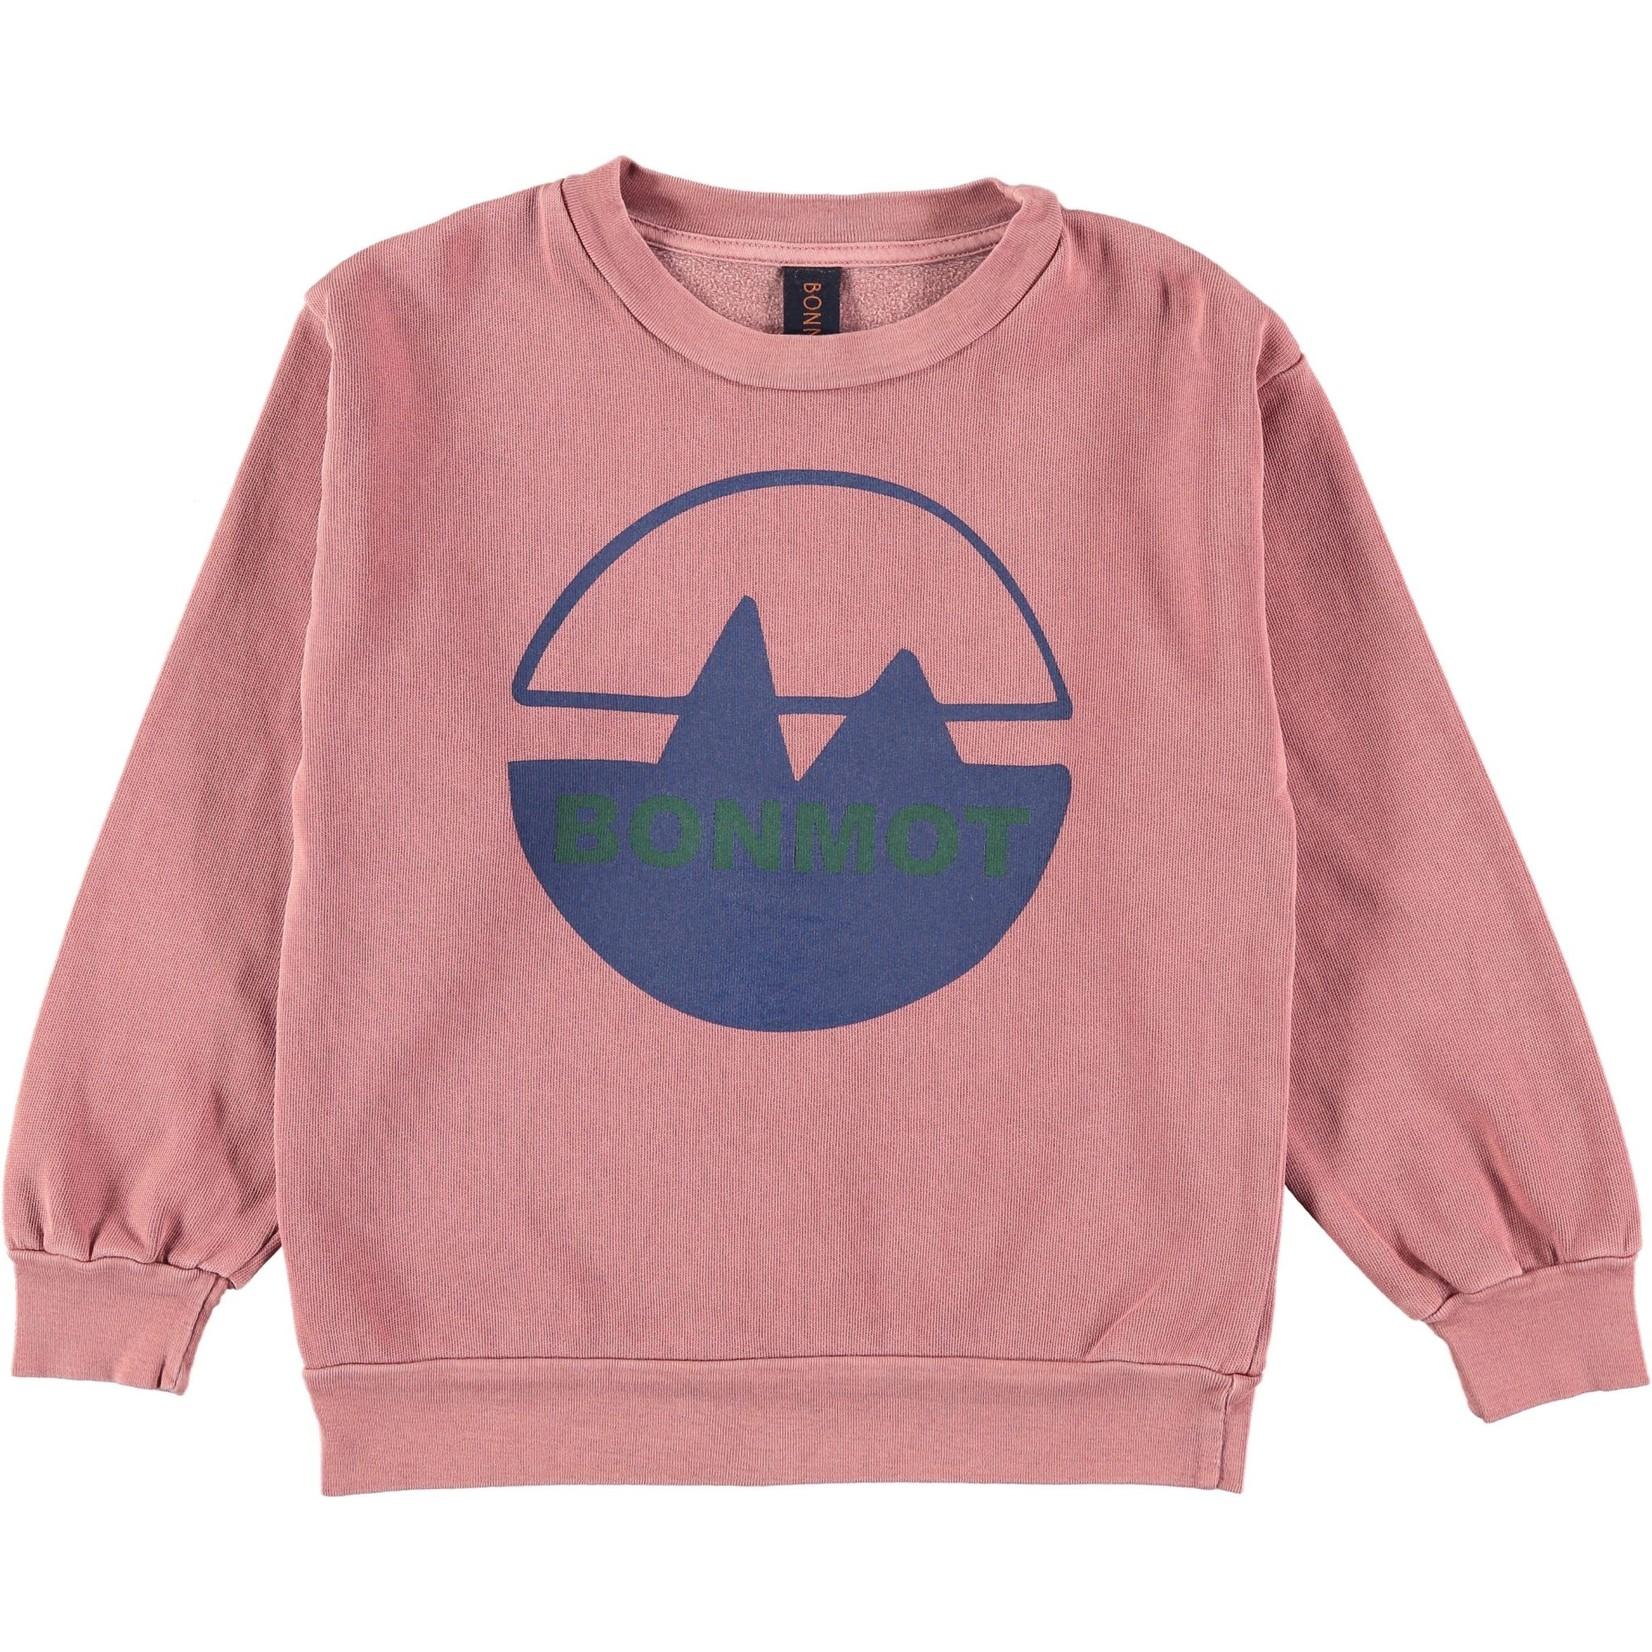 BONMOT BONMOT organic. Sweatshirt bonmot mountain